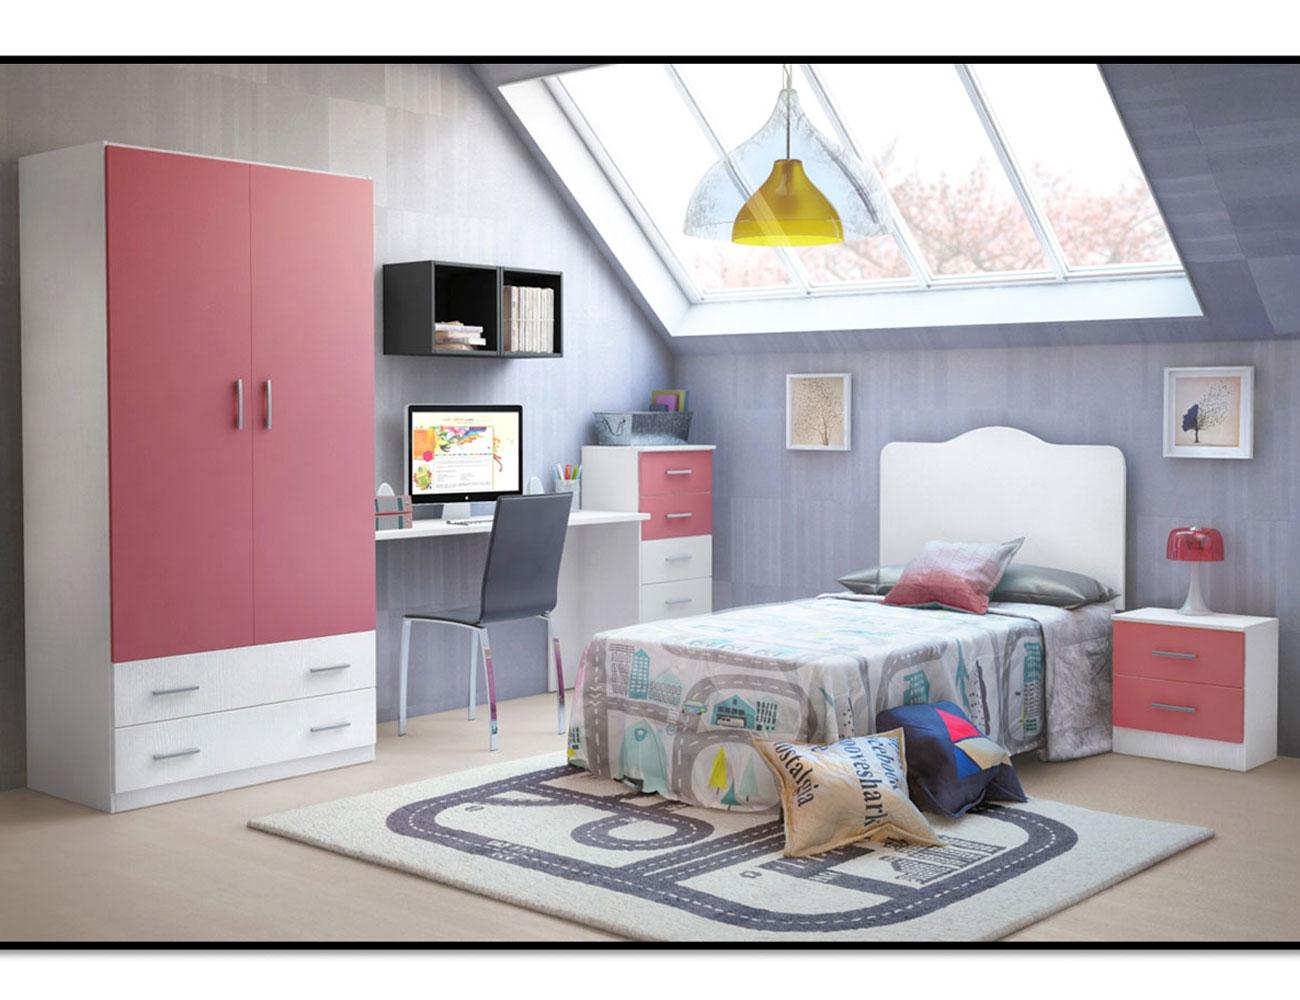 06 dormitorio juvenil